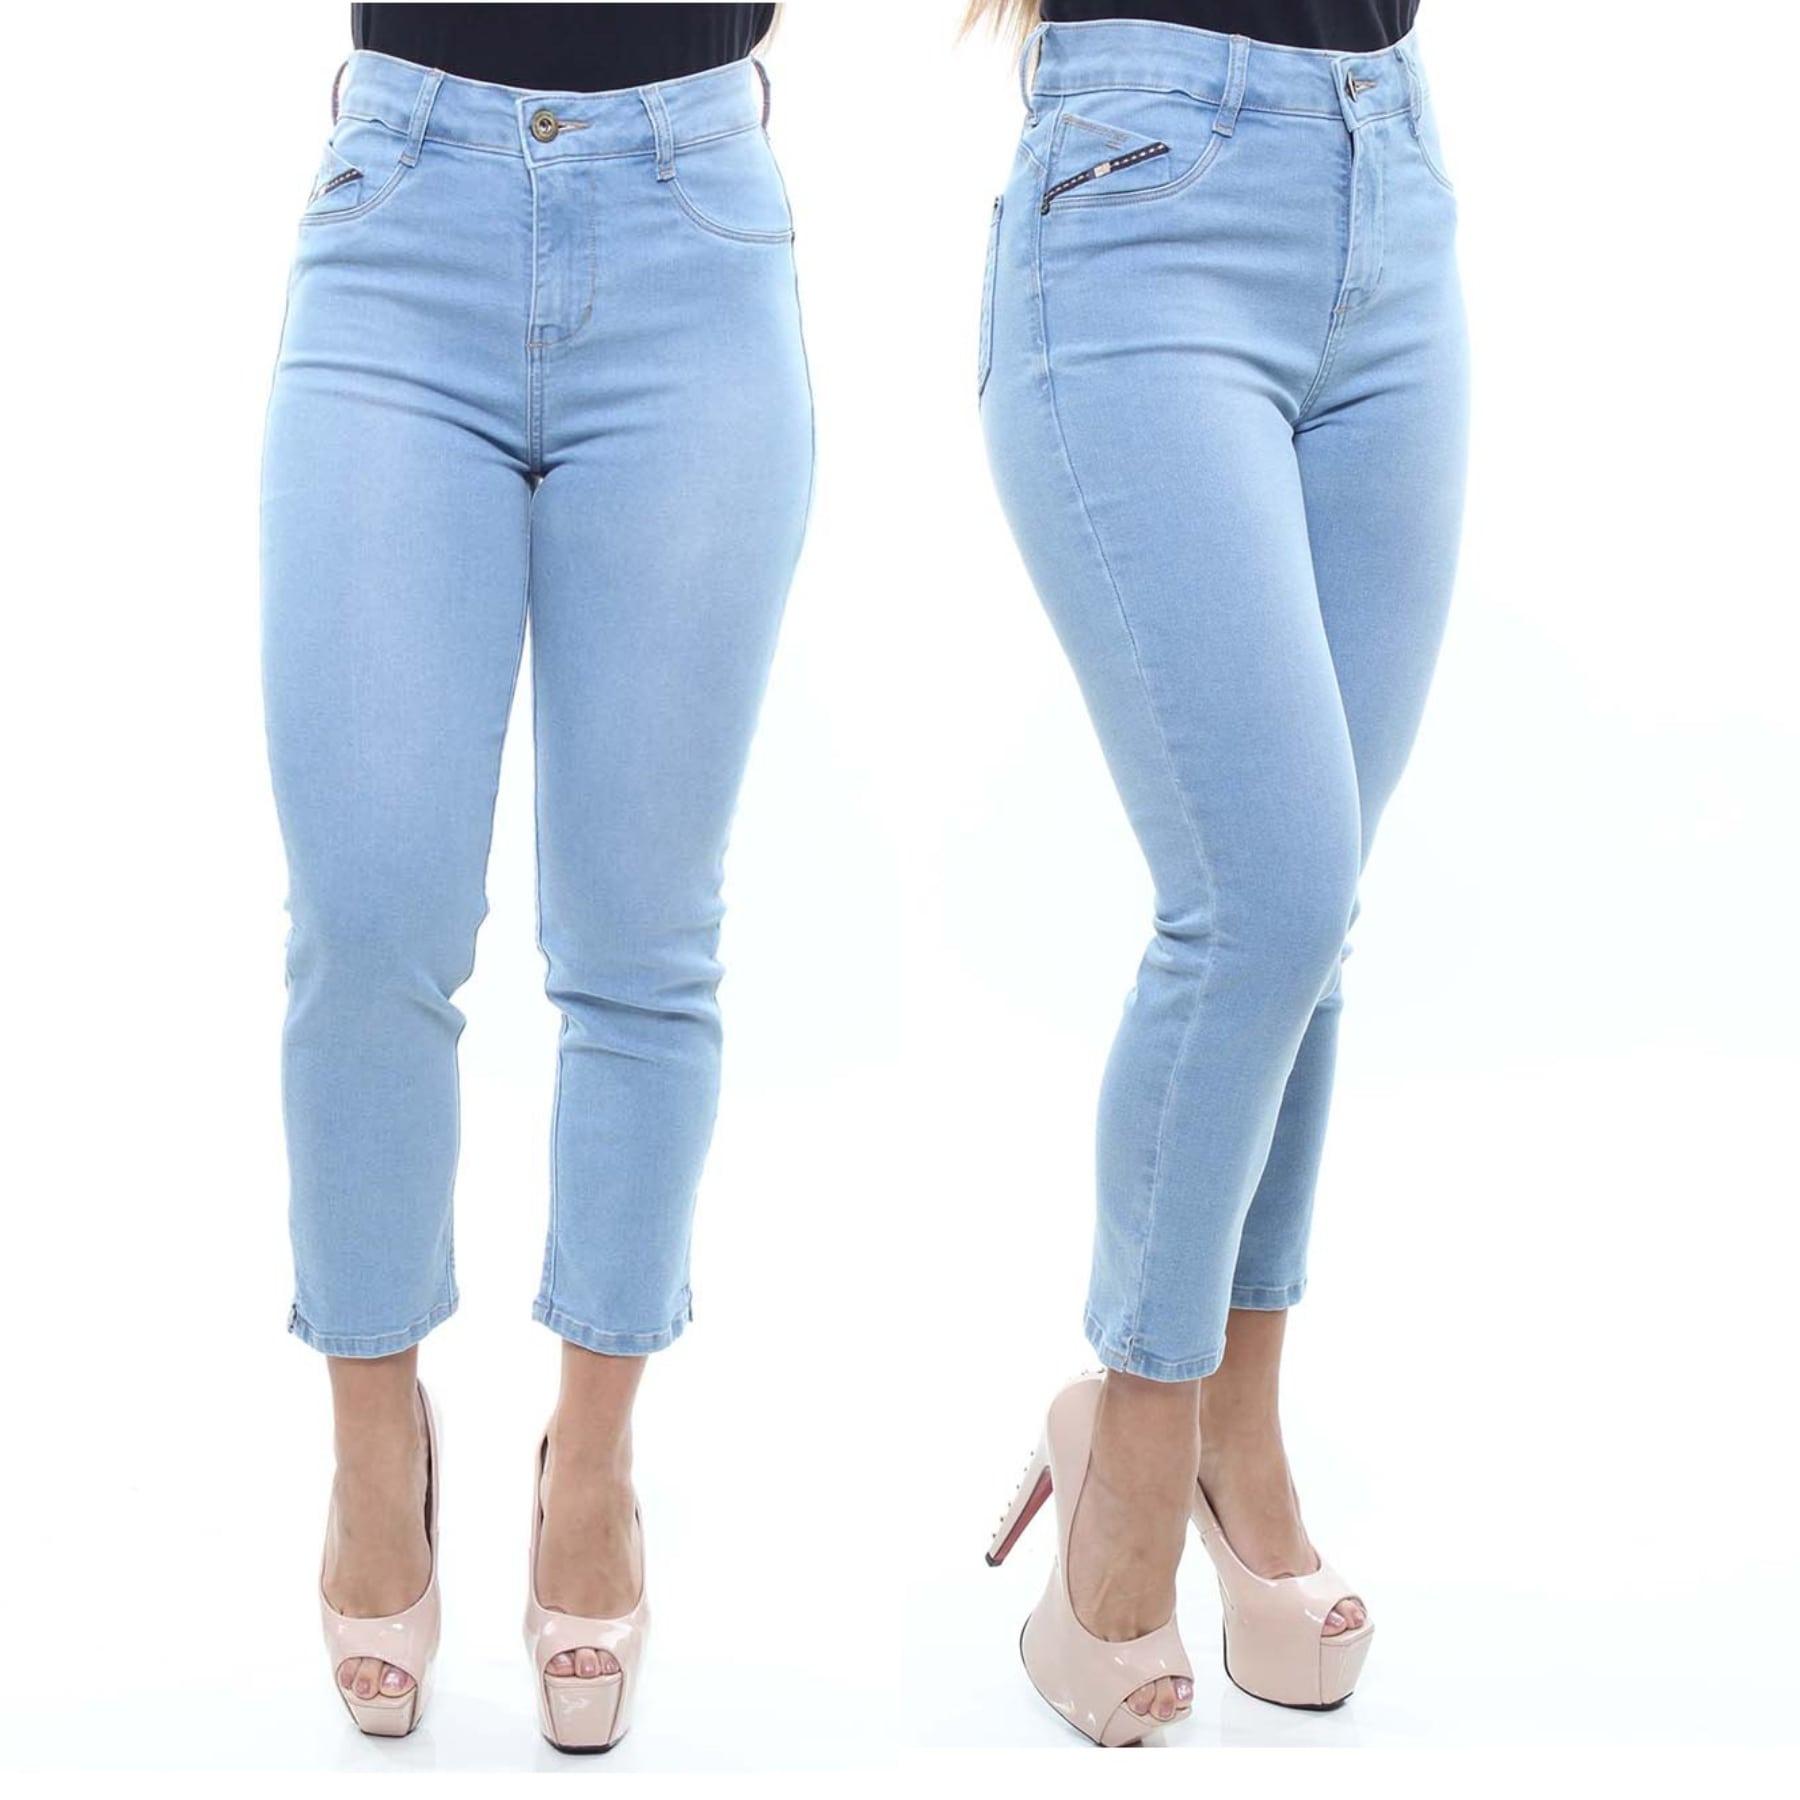 Calça Jeans Feminina Capri Cor Jeans Claro